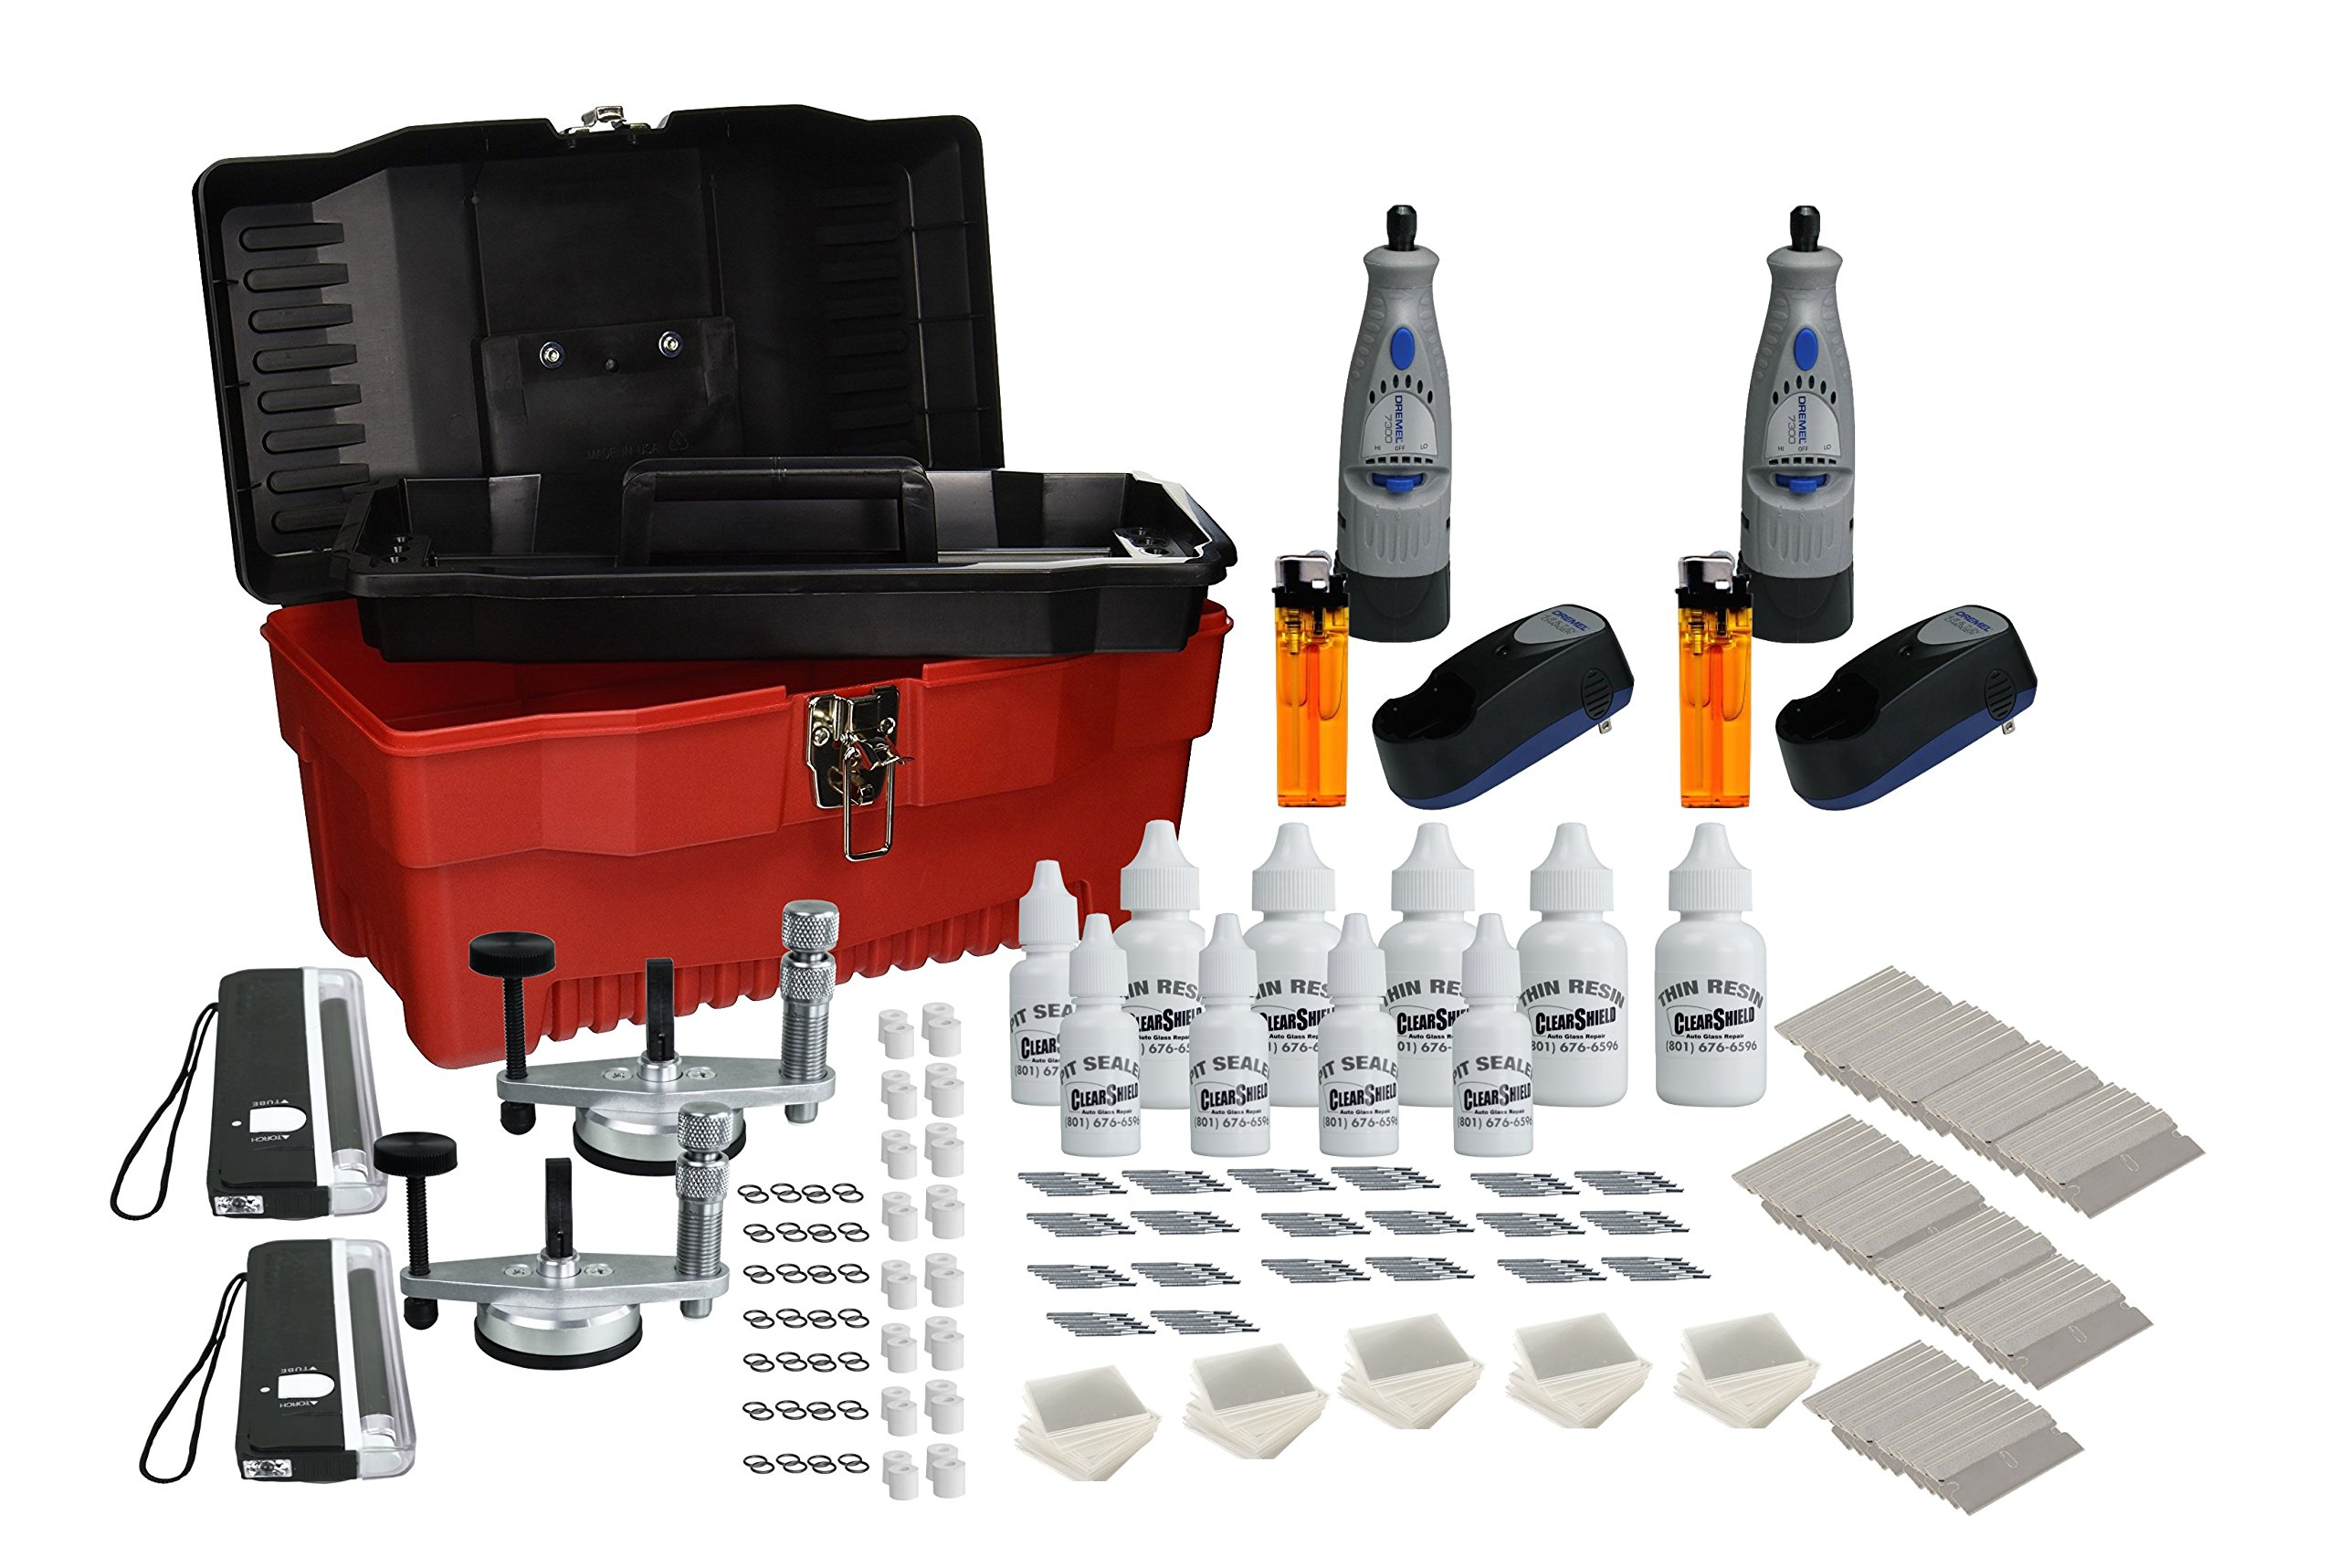 Professional Windshield Repair Kit: Performs Over 1,000 Rock Chip Repairs